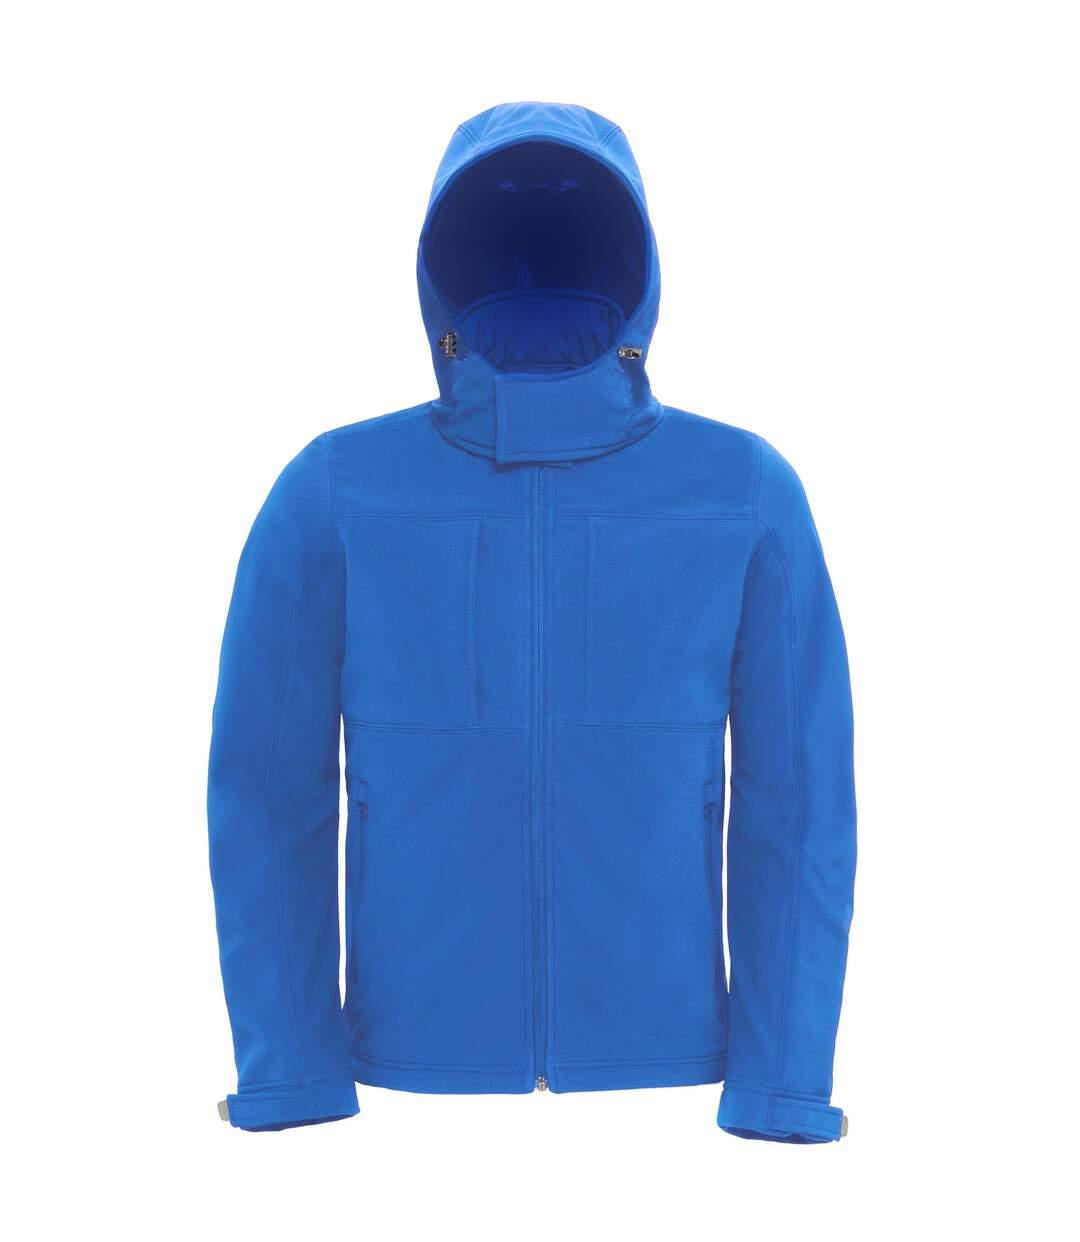 B&C Mens Hooded Softshell Breathable, Waterproof & Windproof Jacket (Fleece Lining) (Azure Blue) - UTBC2001